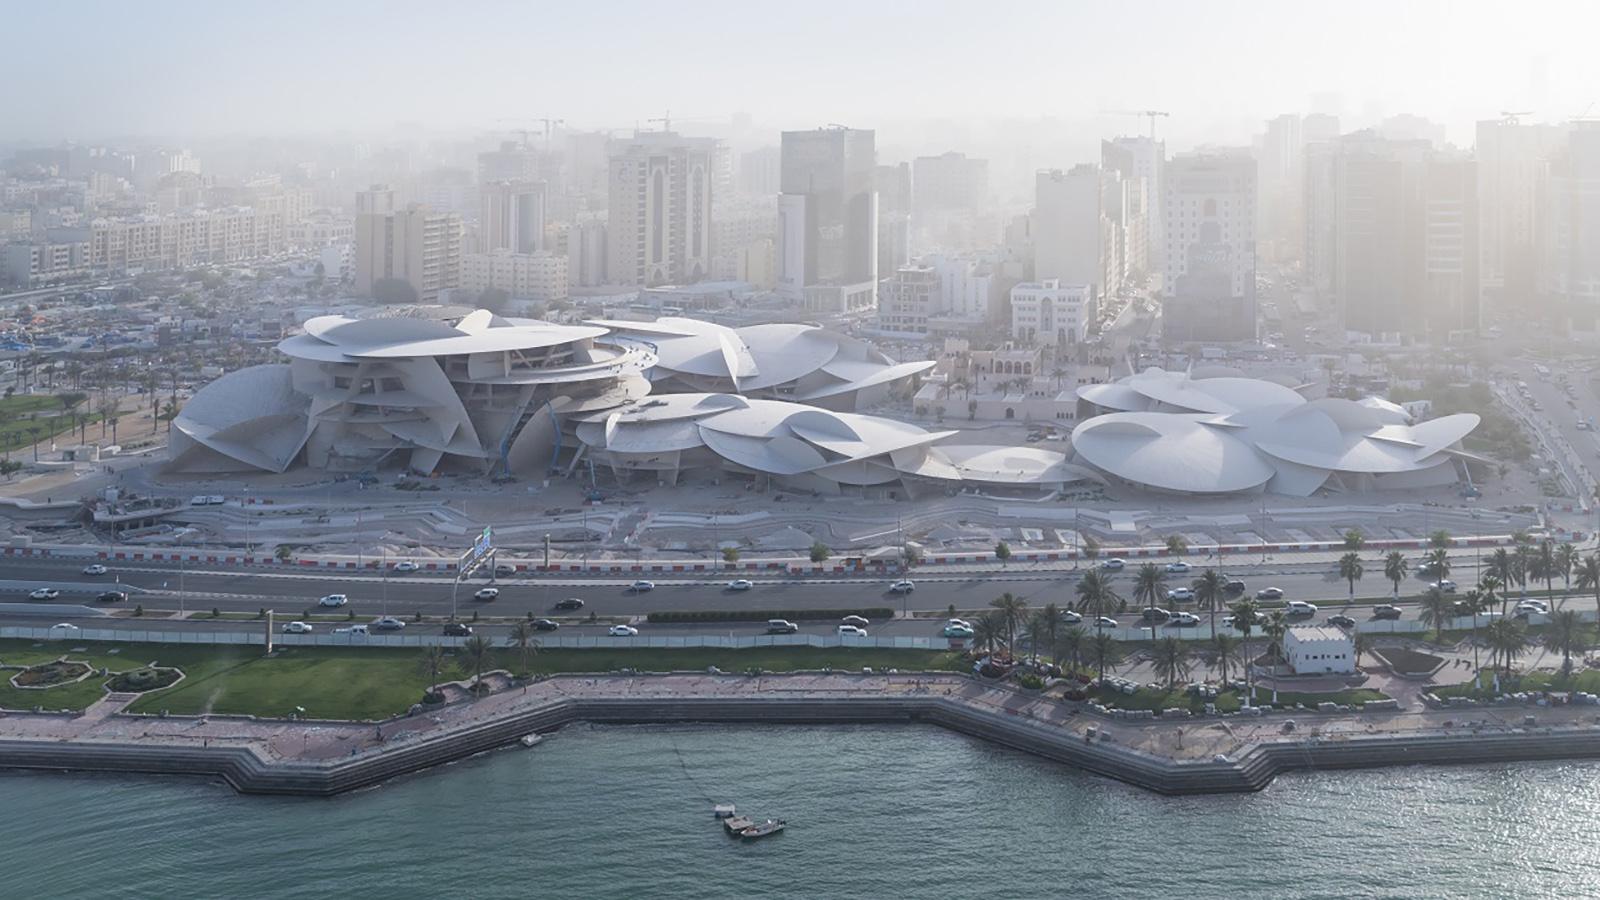 National Museum of Qatar opens | CNN Travel